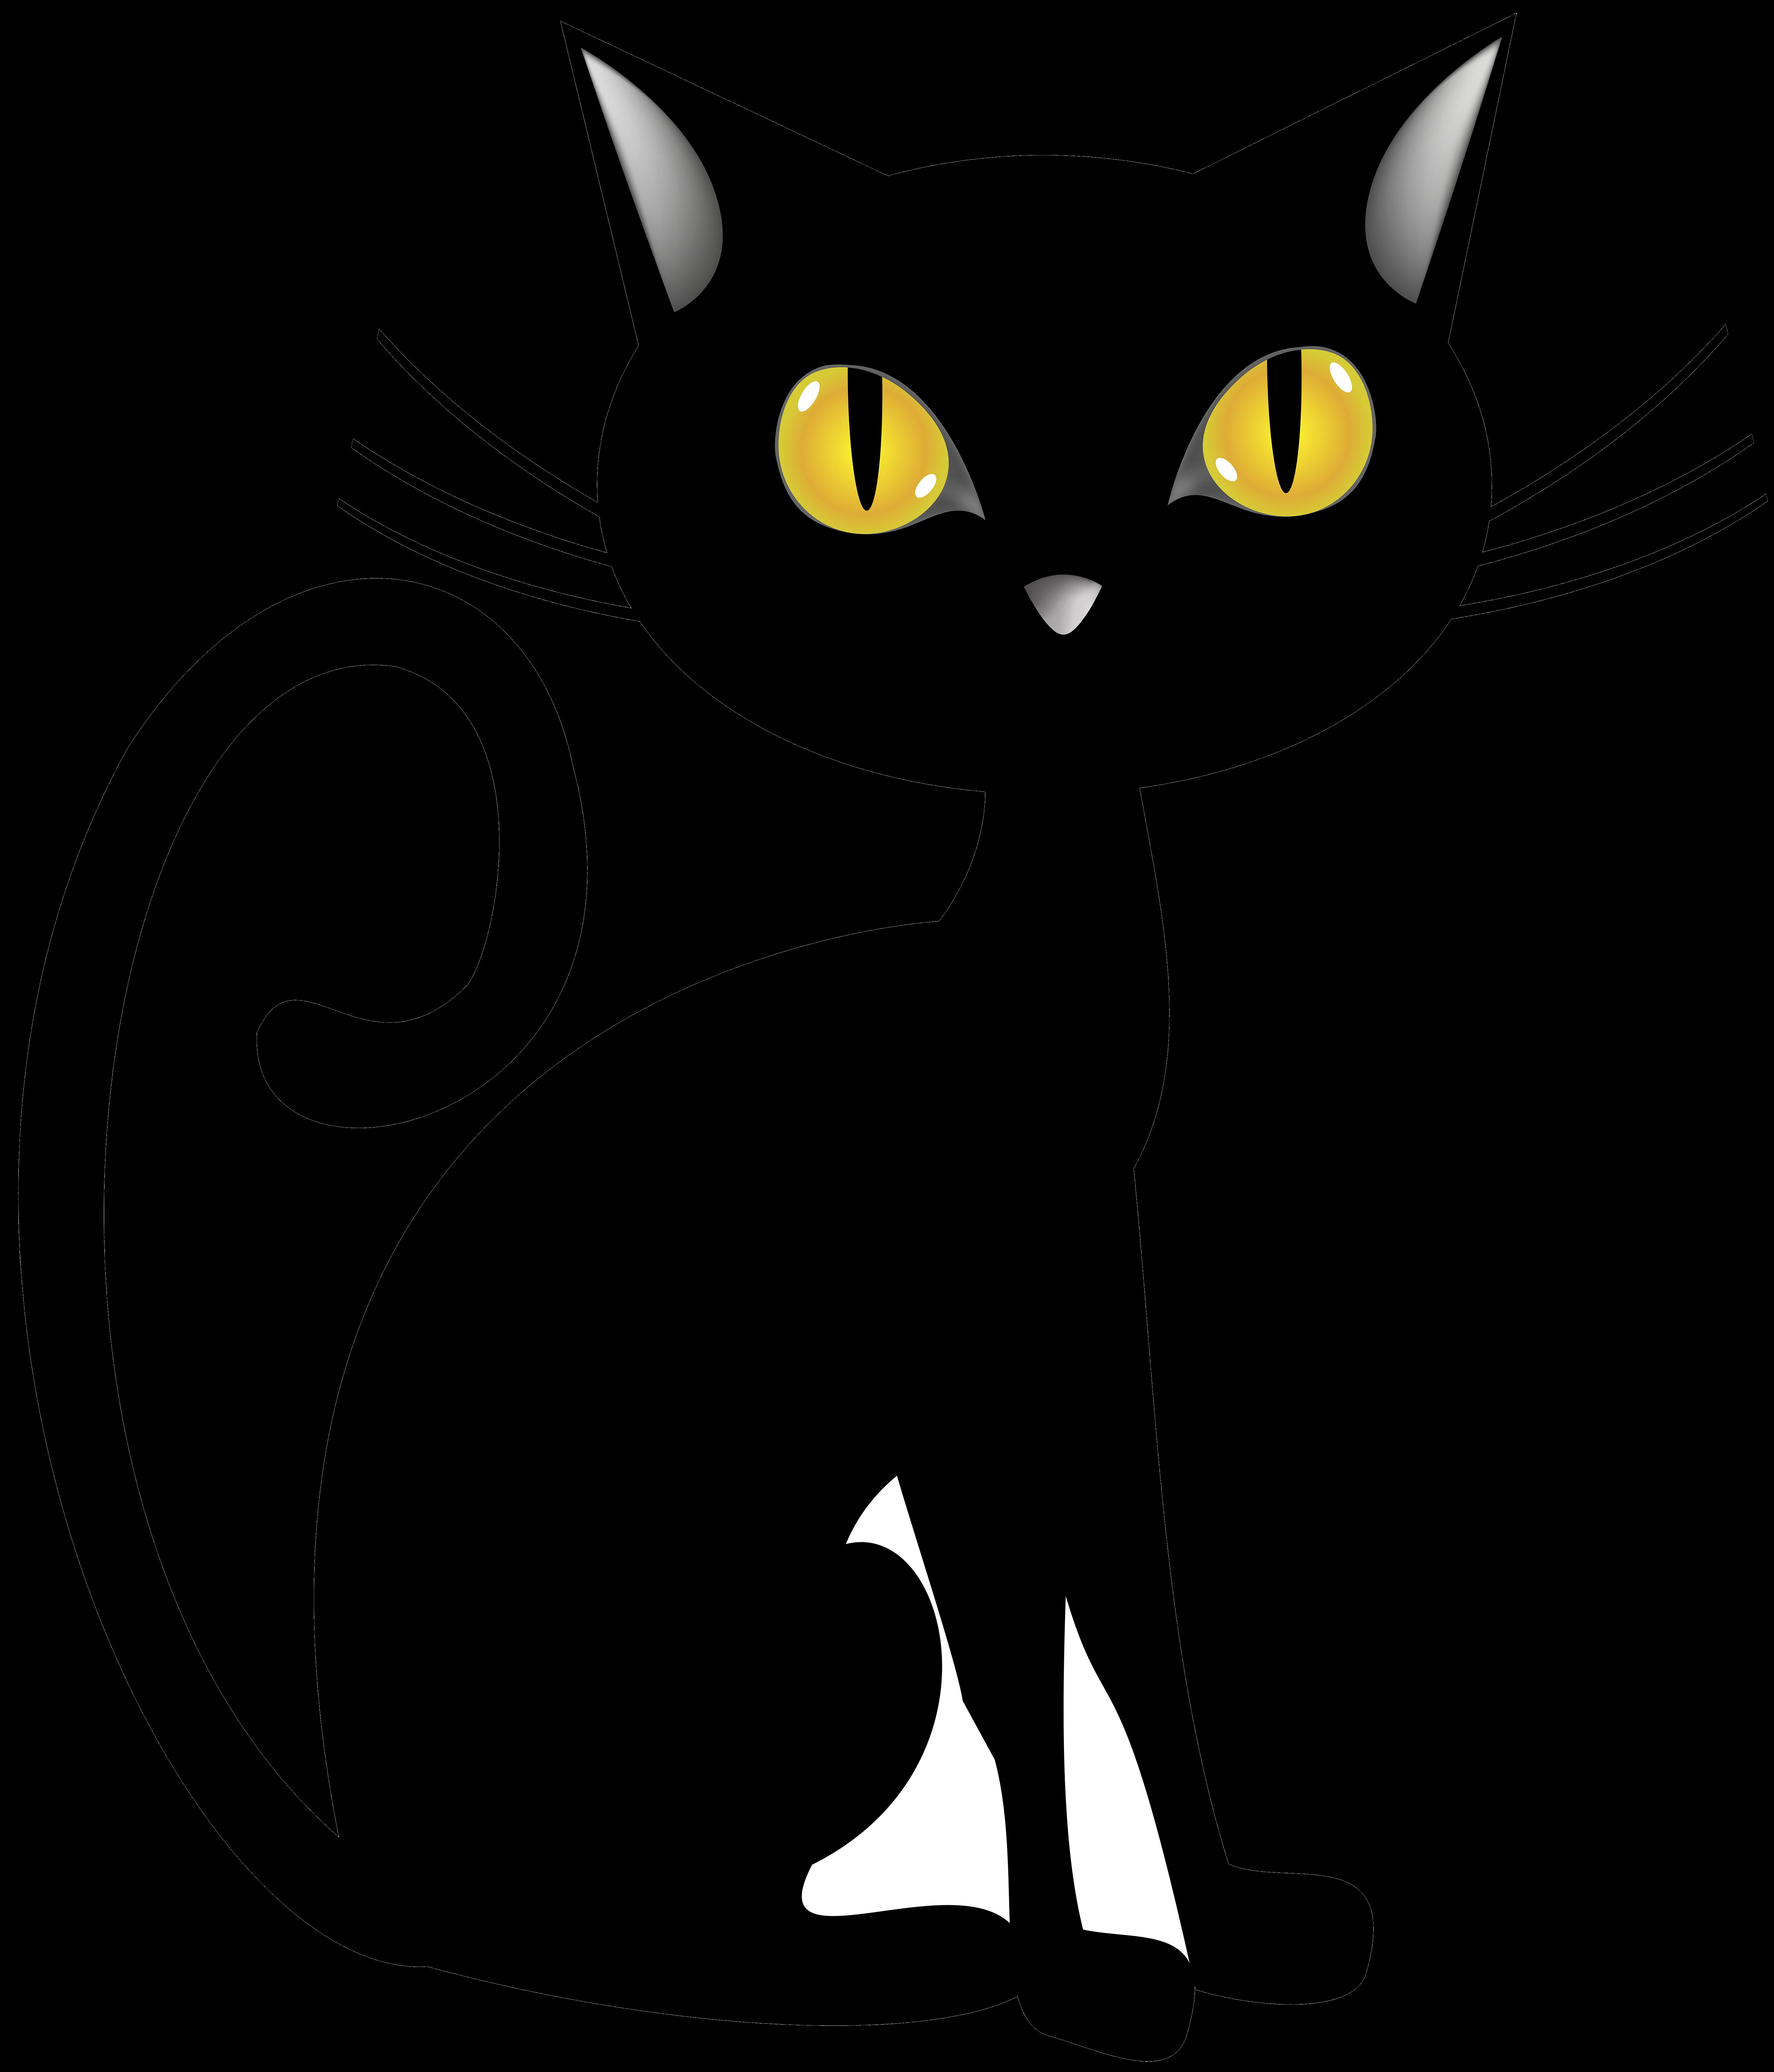 Clipart halloween black cat, Clipart halloween black cat.